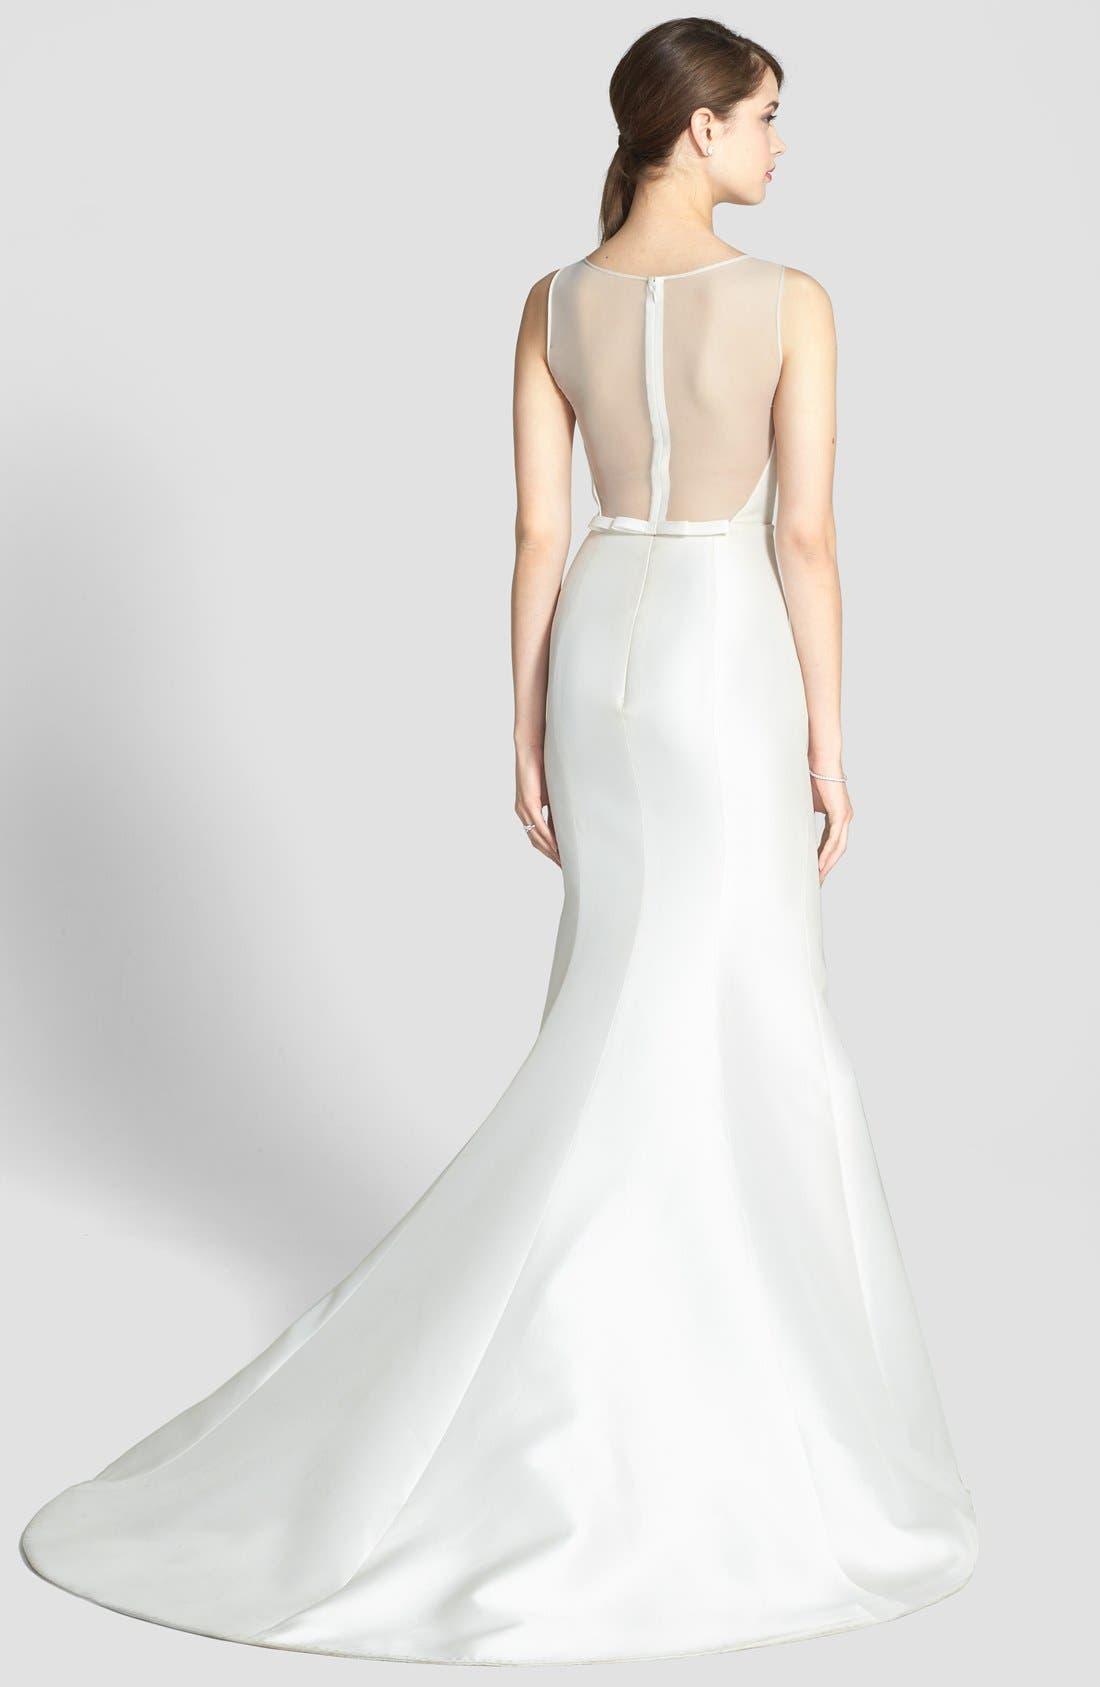 Silk Wedding Dresses & Bridal Gowns | Nordstrom